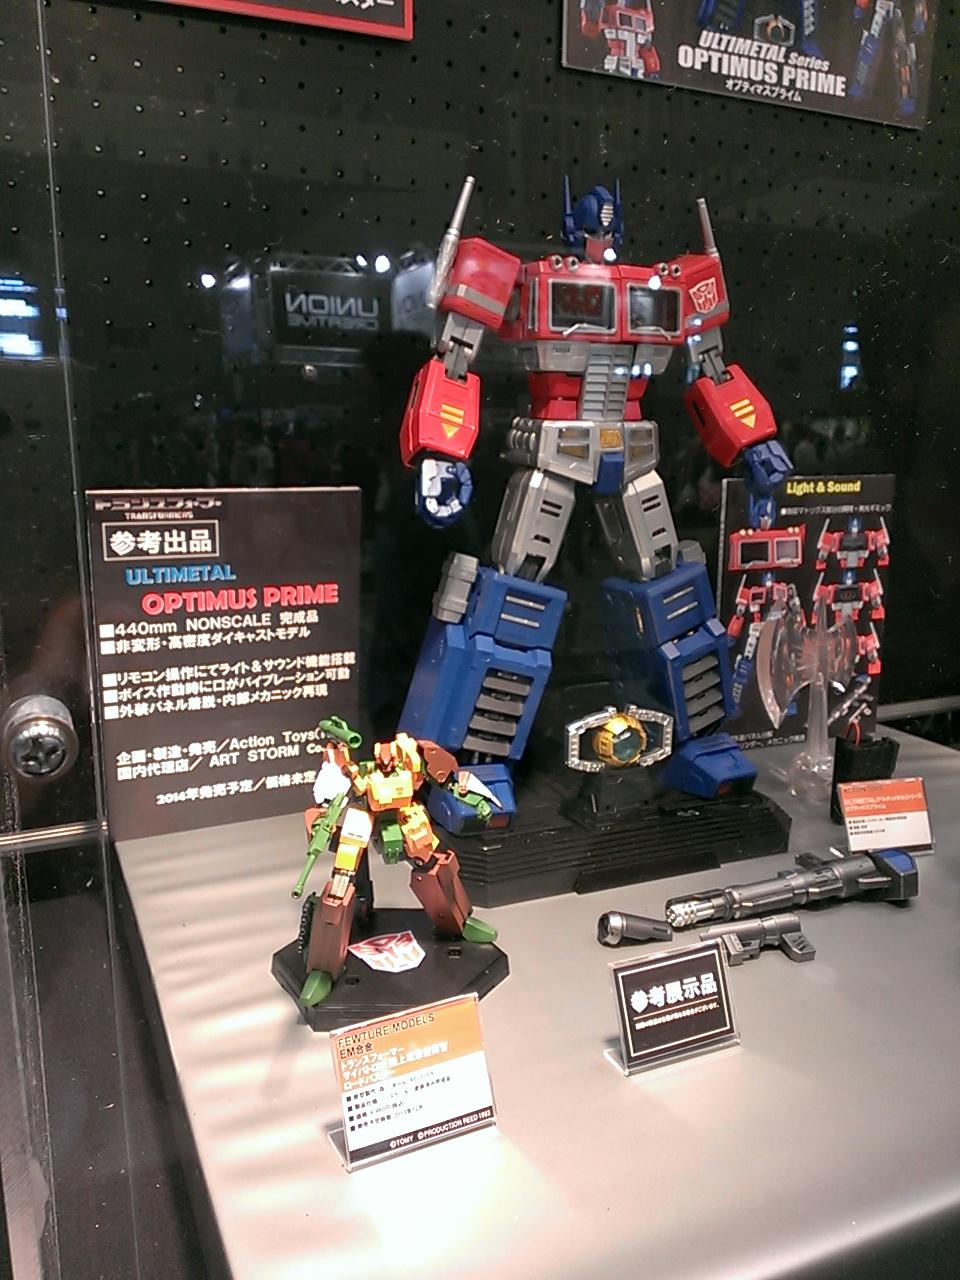 Figurines Transformers G1 (articulé, non transformable) ― Par 3A, Action Toys, Fewture, Toys Alliance, Sentinel, Kotobukiya, Kids Logic, Herocross, EX Gokin, etc 1374986386940_1375005162